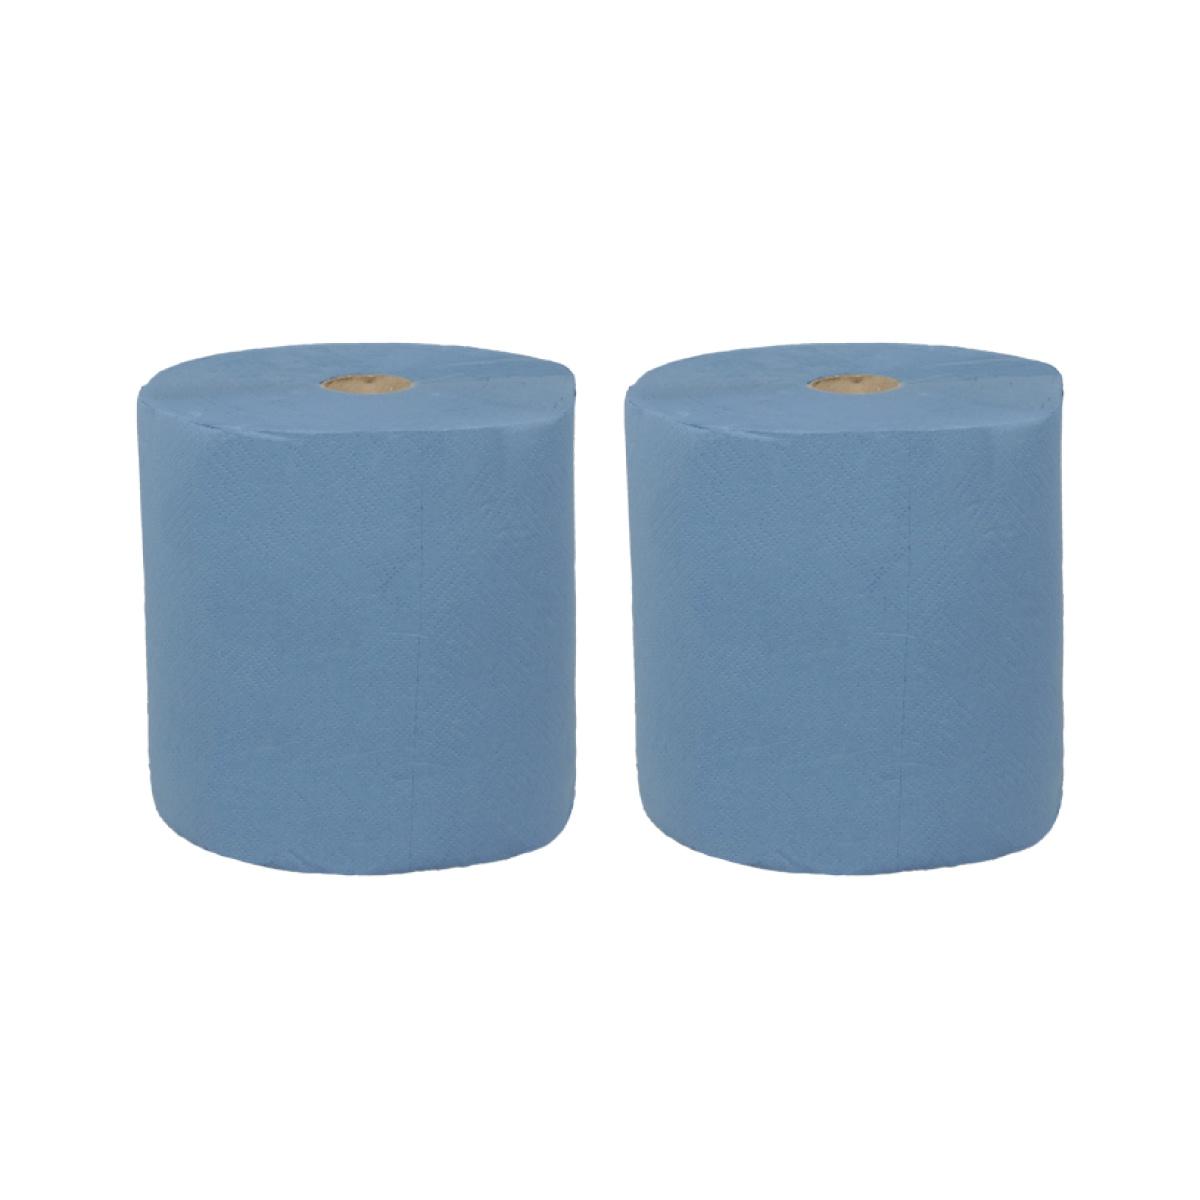 TTC Papirna rolna za čišćenje, plava, 100% celuloza, dužina: 240m. Pakovanje: 2 rolne. EU Ecolabel sertifikat